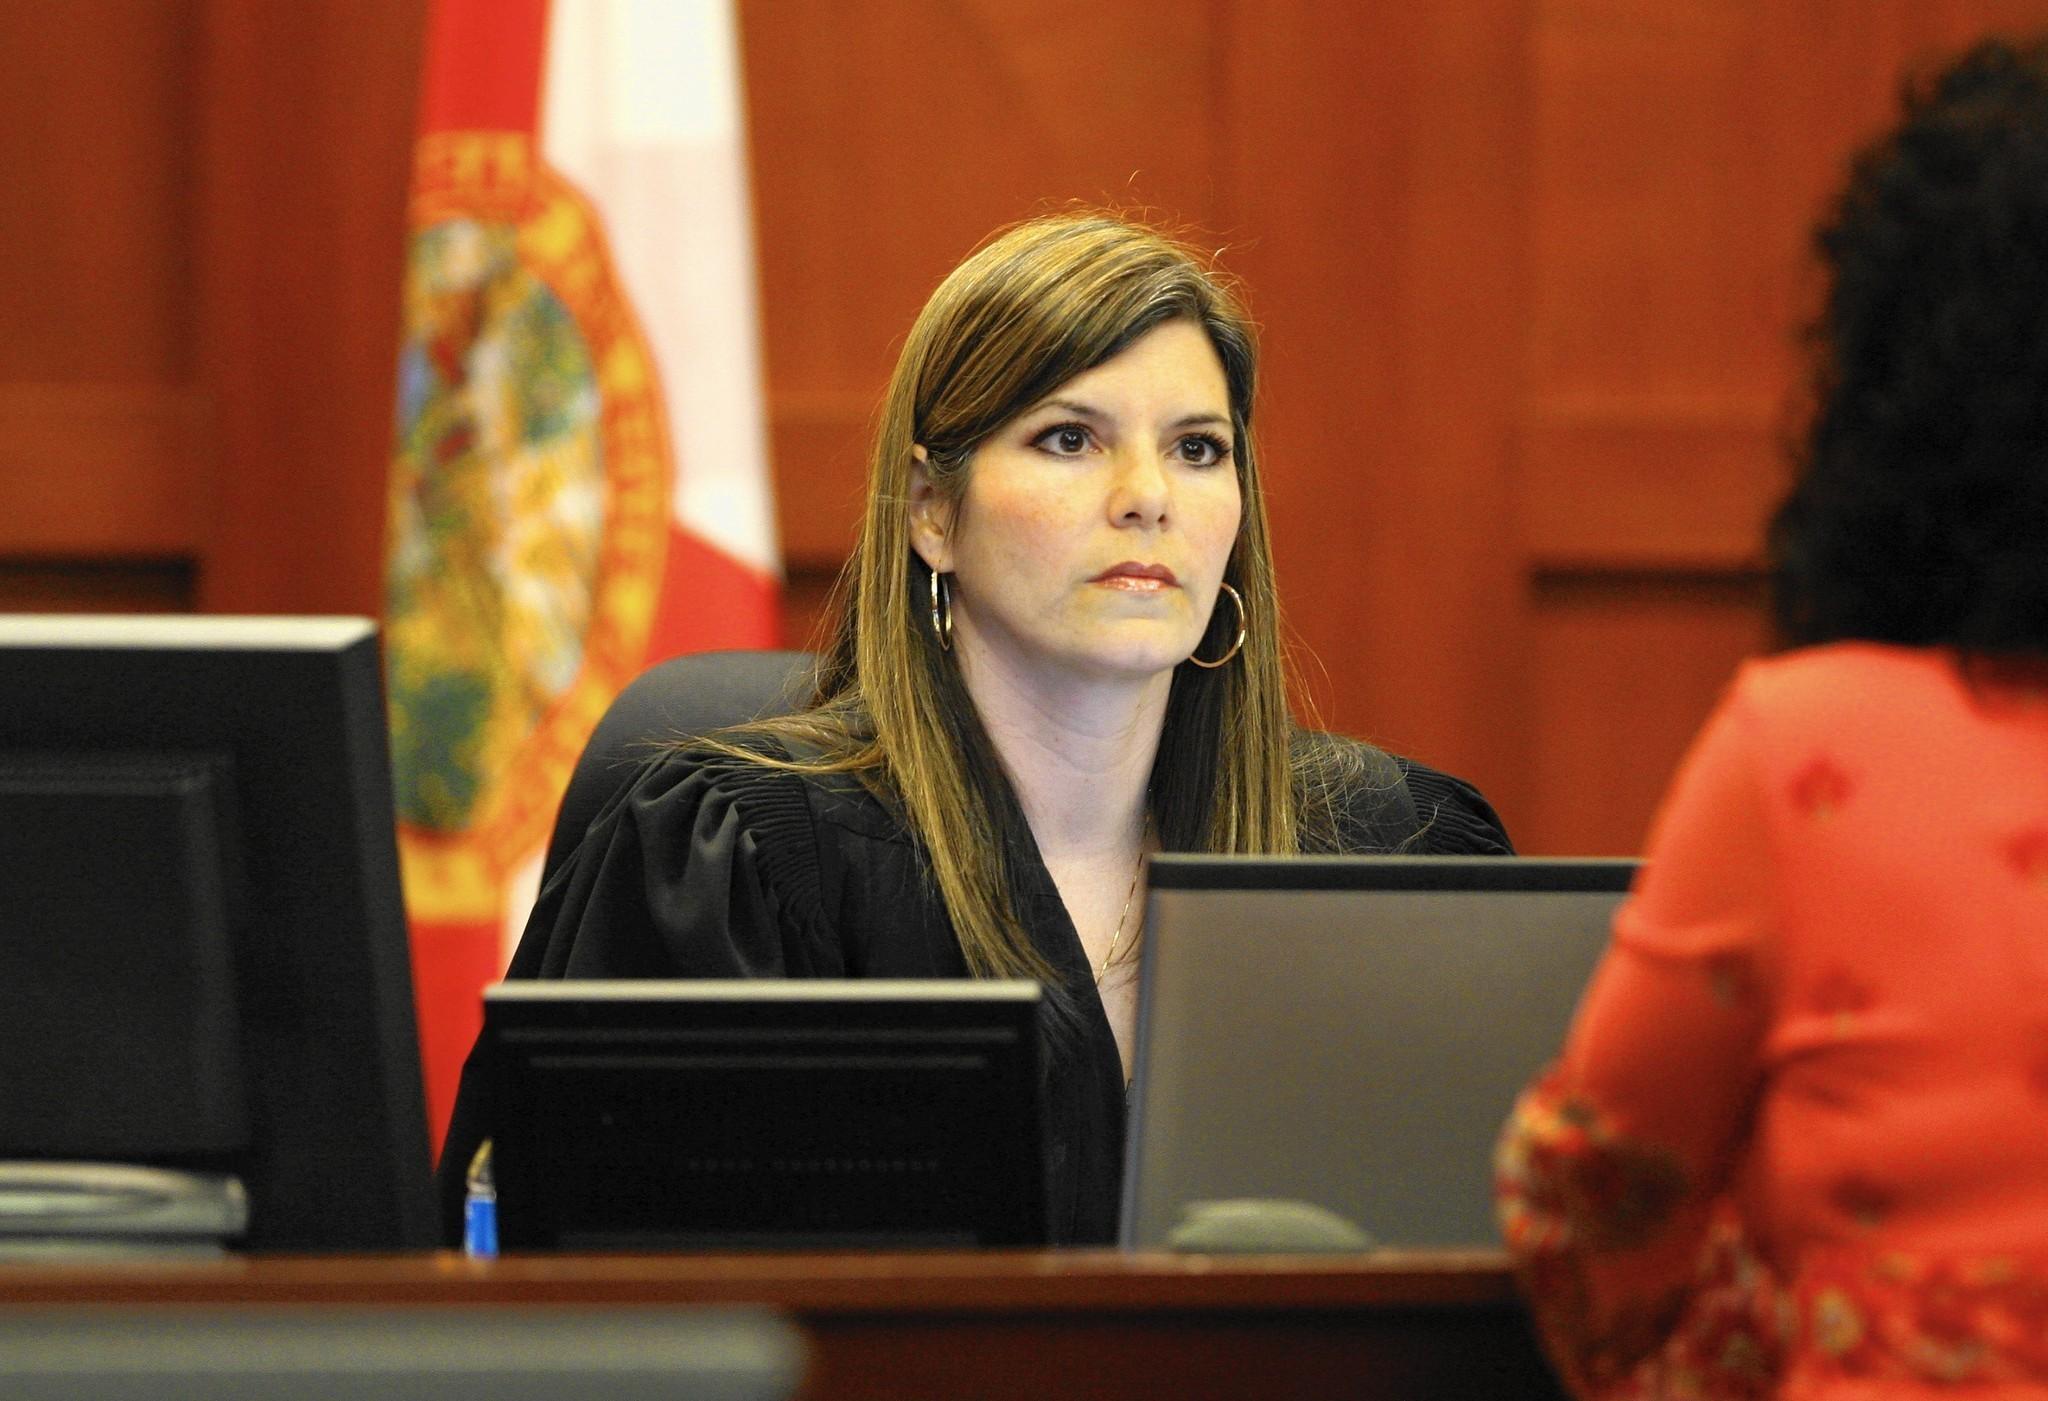 How To Fight A Speeding Ticket >> Circuit Judge Jessica Recksiedler faces discipline for ...